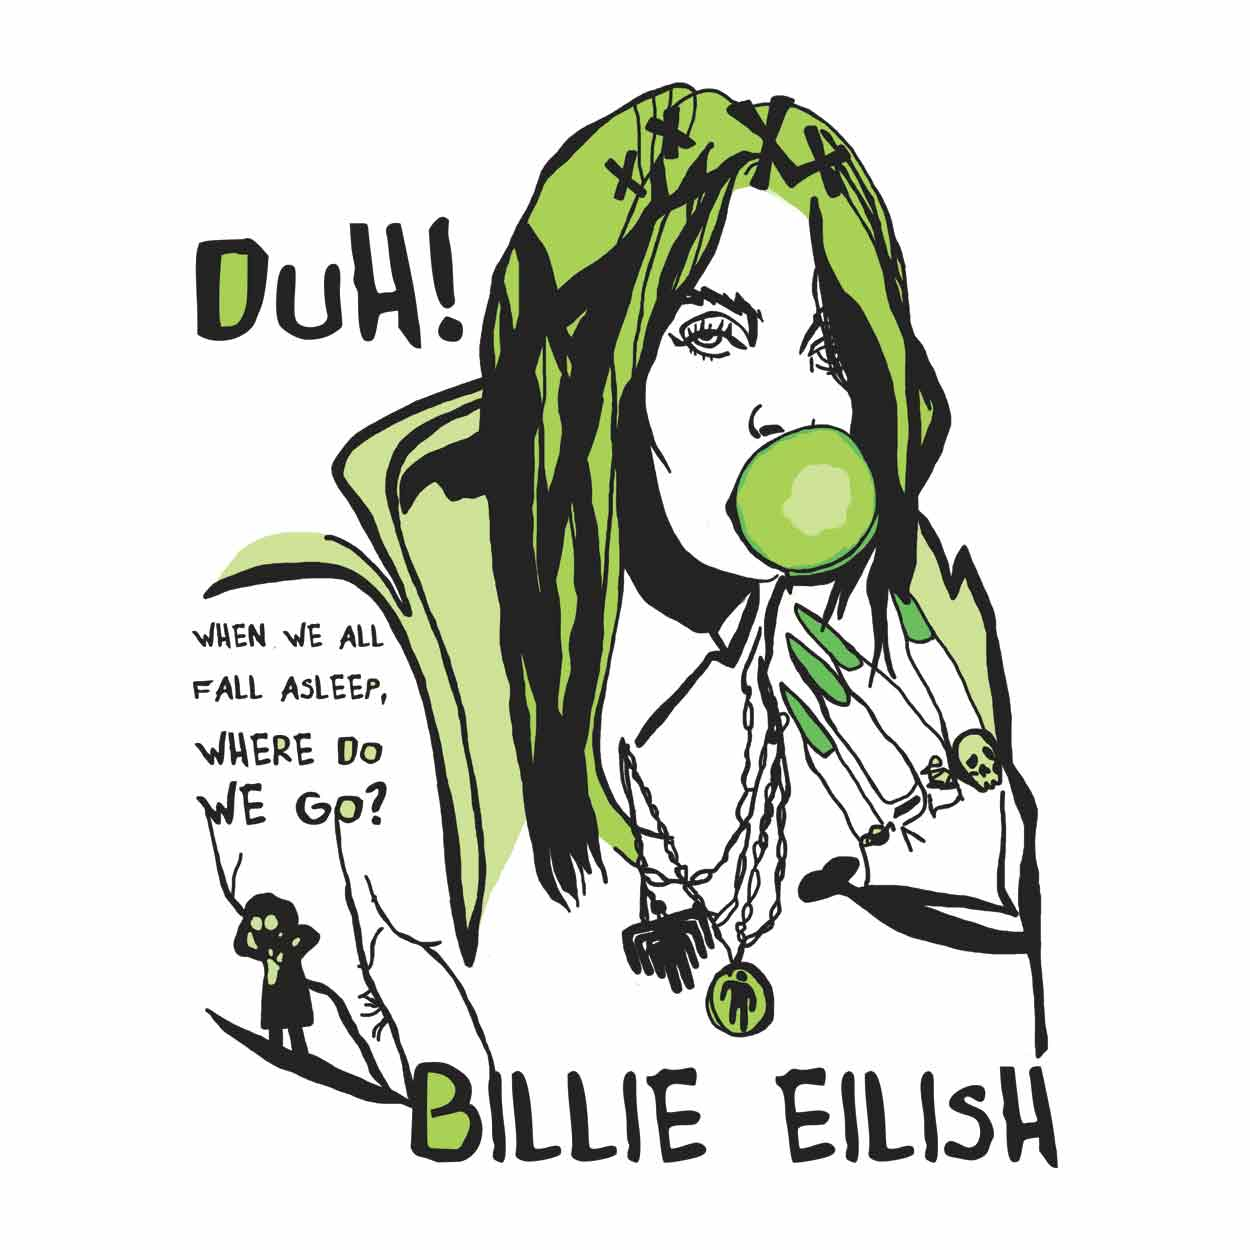 Camiseta - When We All Fall Asleep, Where Do We Go? - Billie Eilish - Feminino